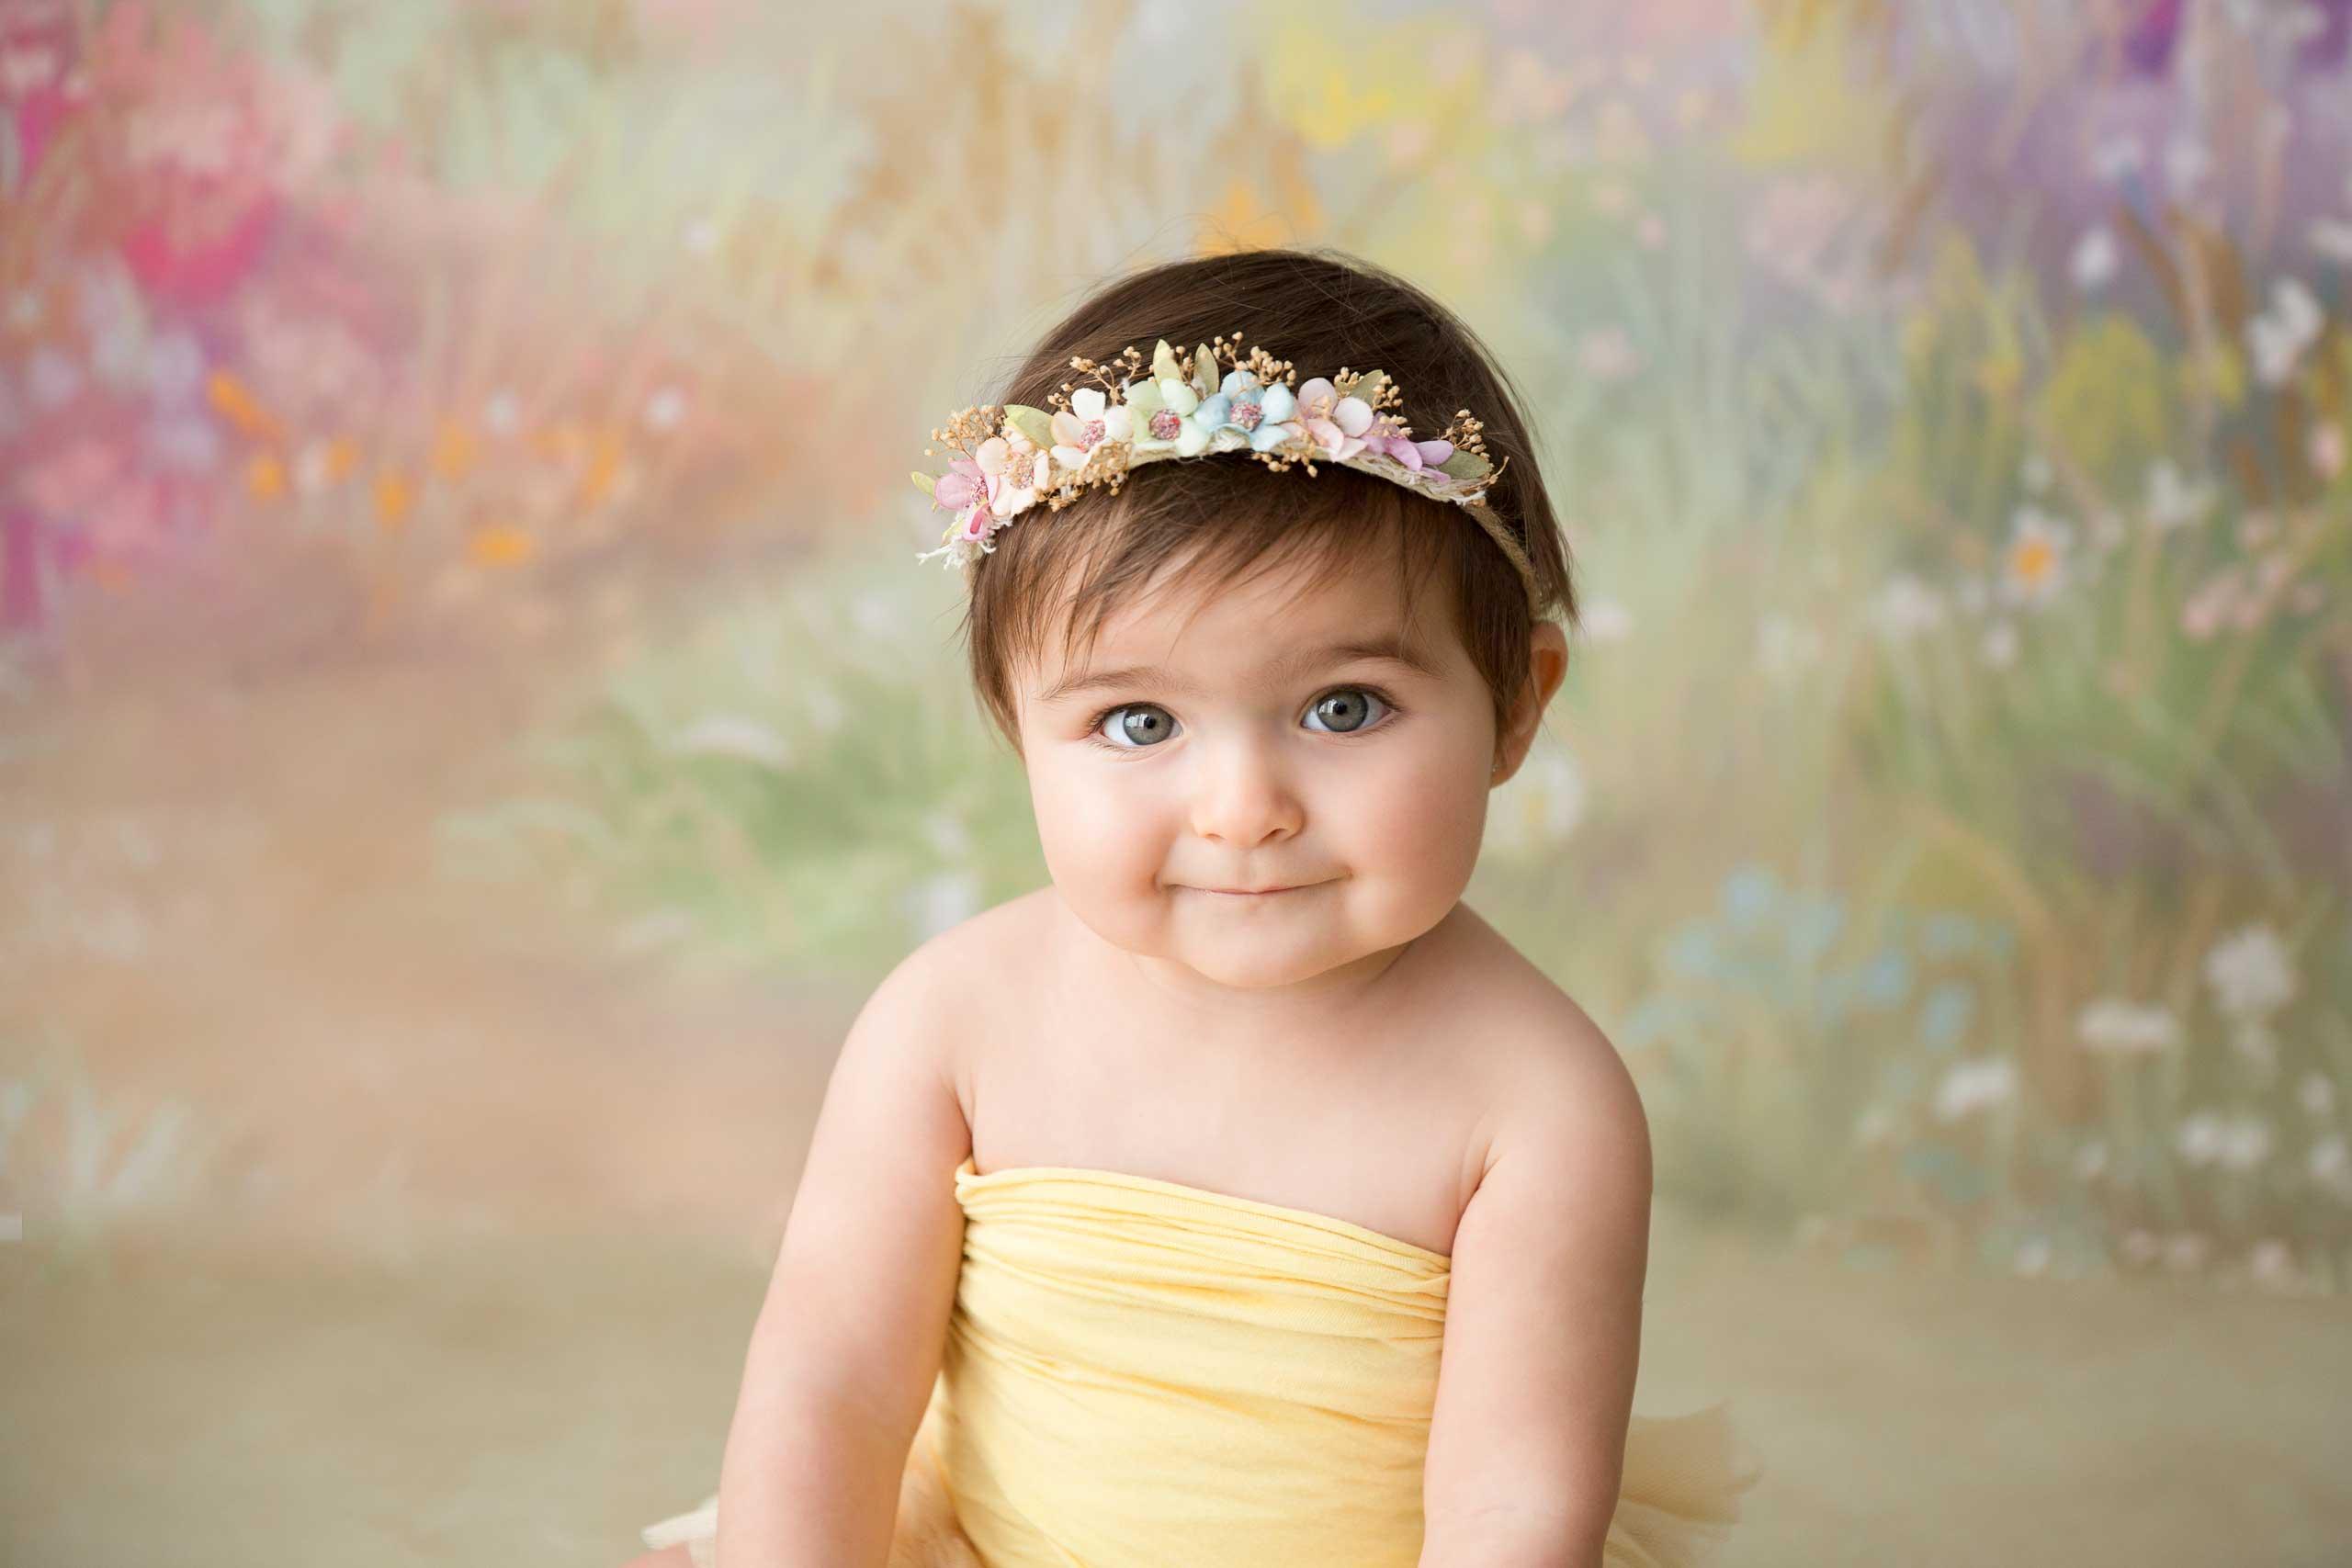 baby sitter photoshoot los angeles ramina magid